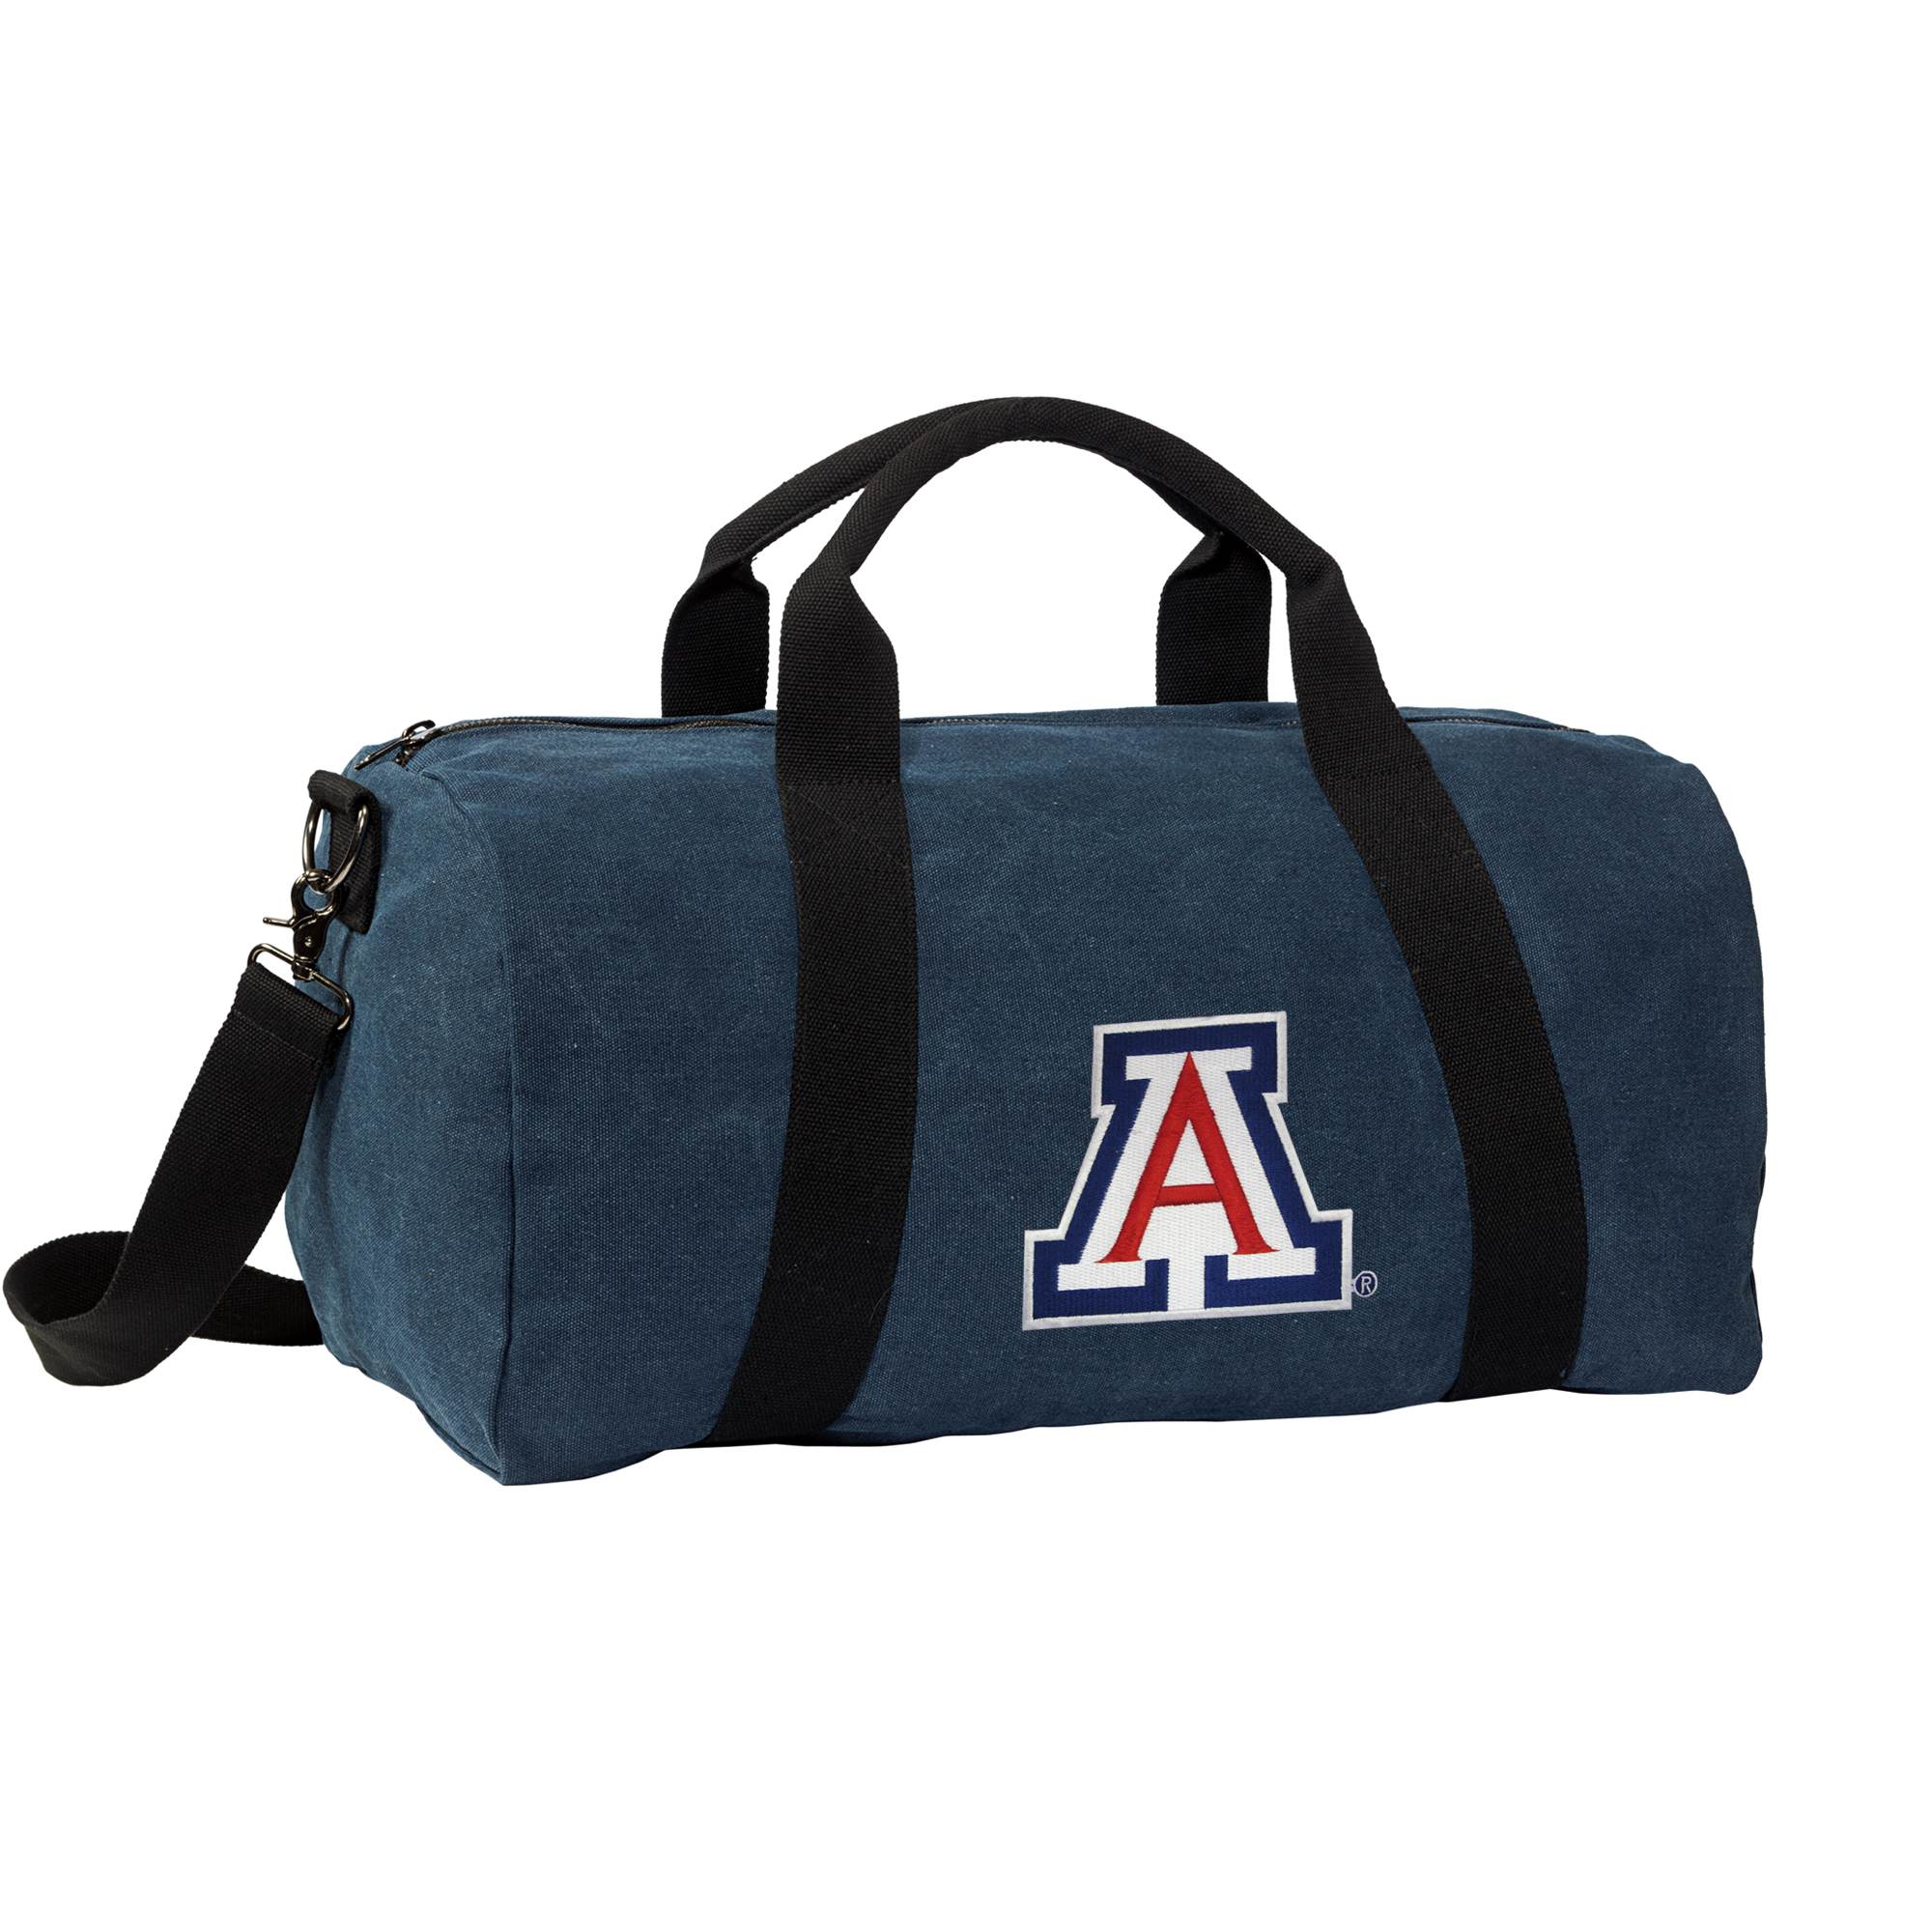 Arizona Wildcats Duffle Bag DELUXE CANVAS University of Arizona Duffels by